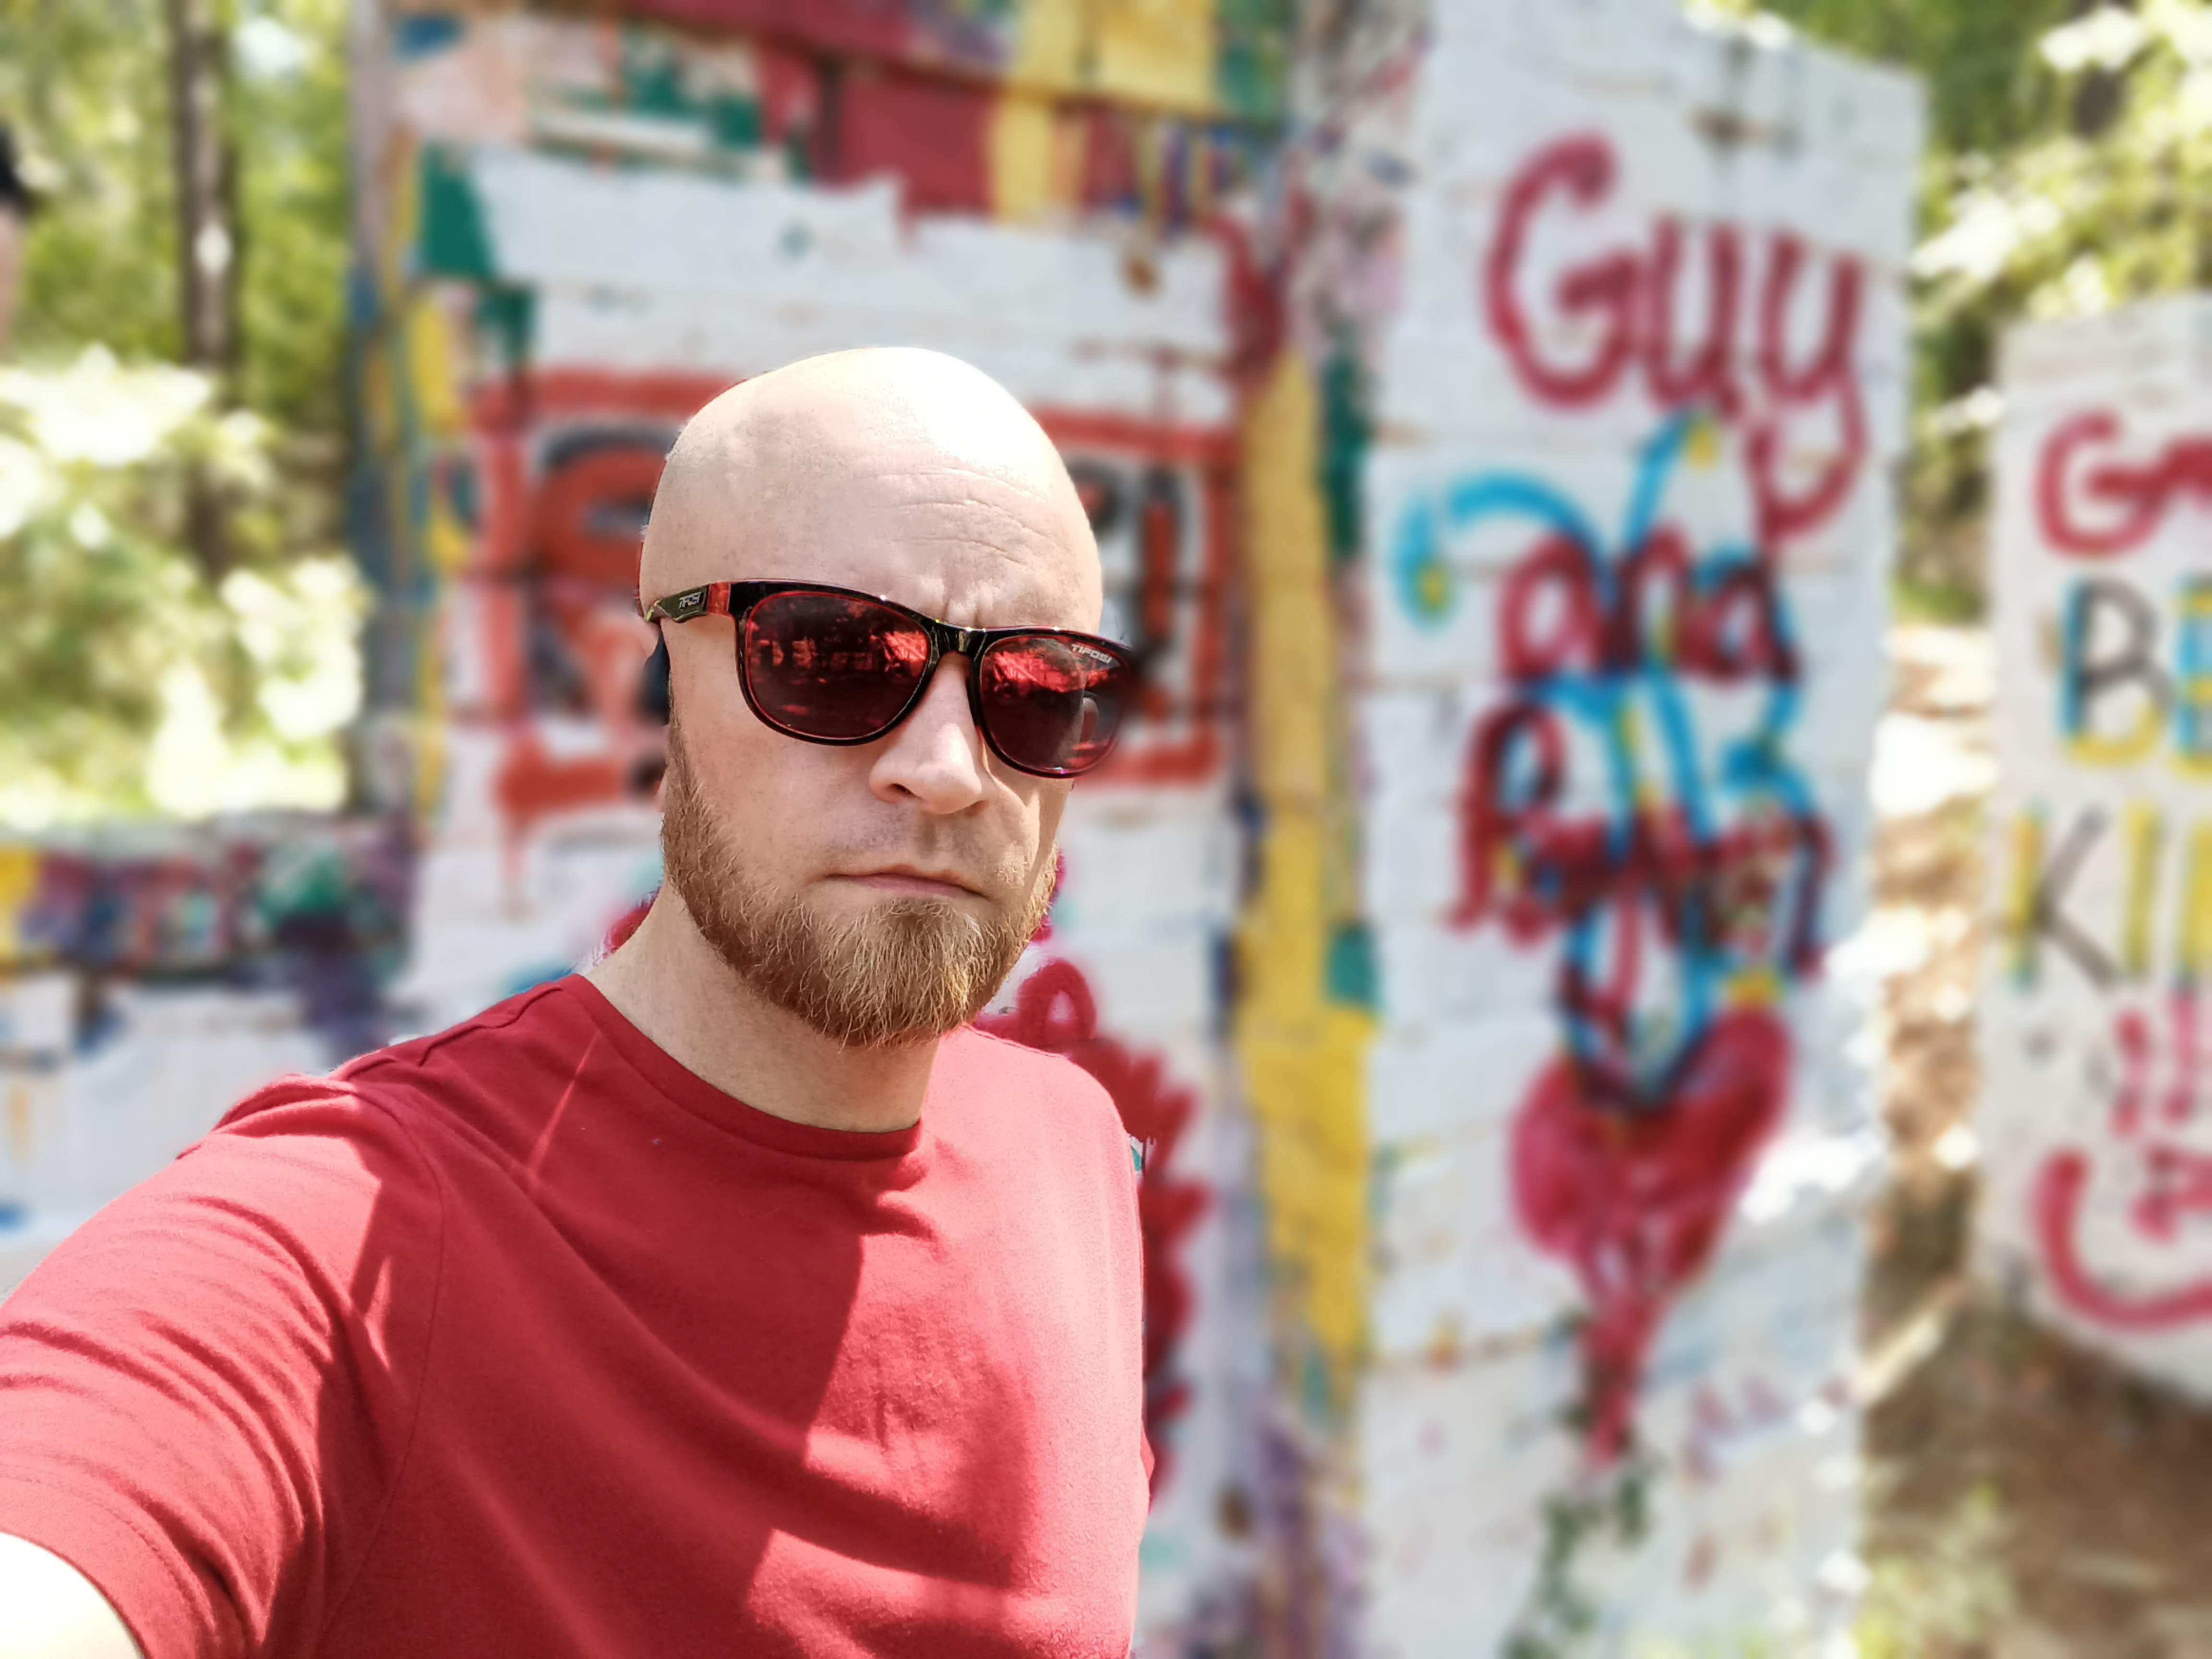 BLU G91 Pro front camera sample: A selfie in front a graffiti wall selfie mode on. Again, my ear is gone.